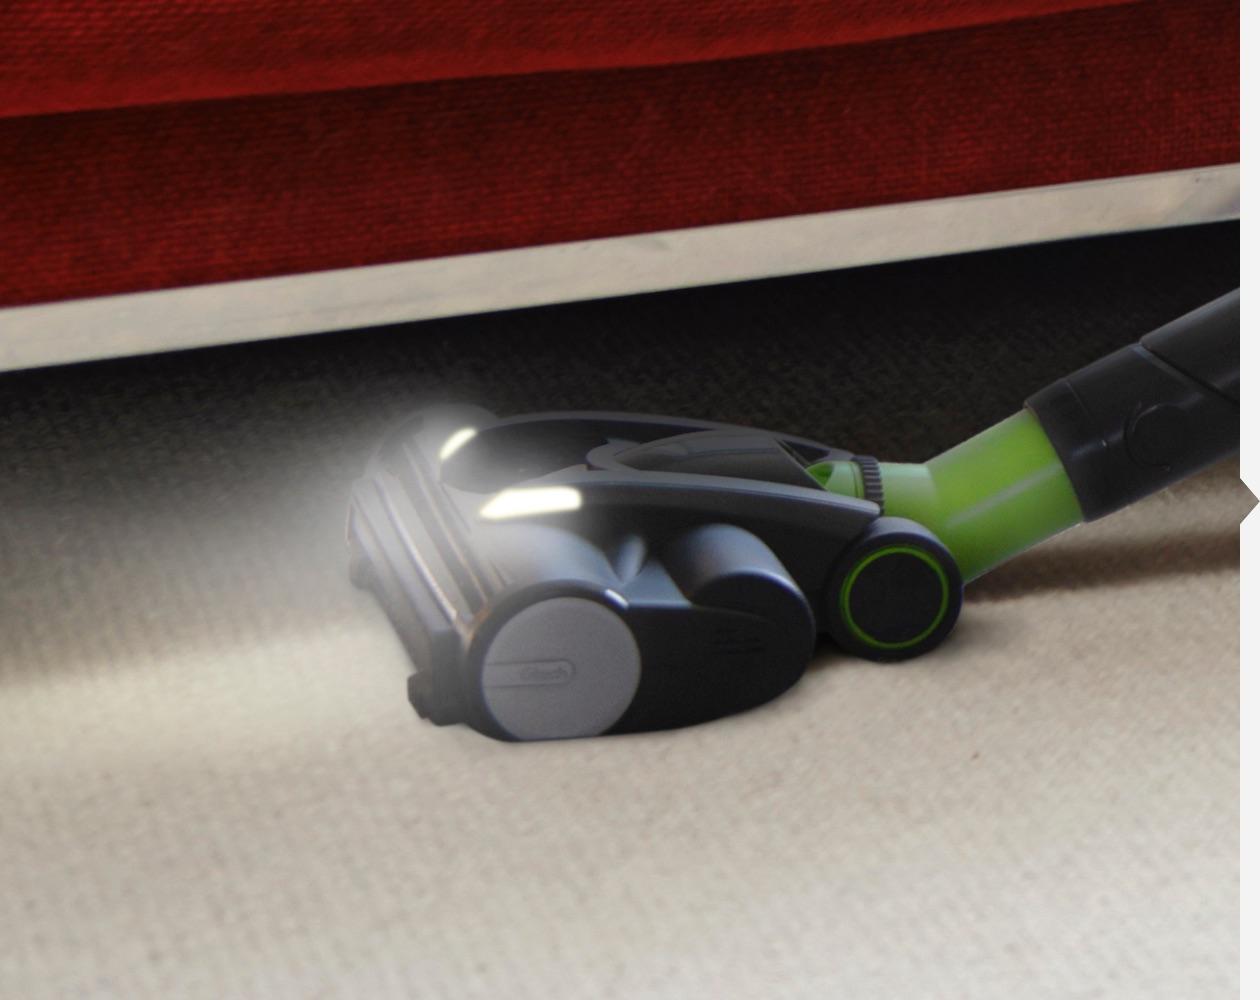 Pro 2 K9 lightweight stick vacuum cleaner LED lights